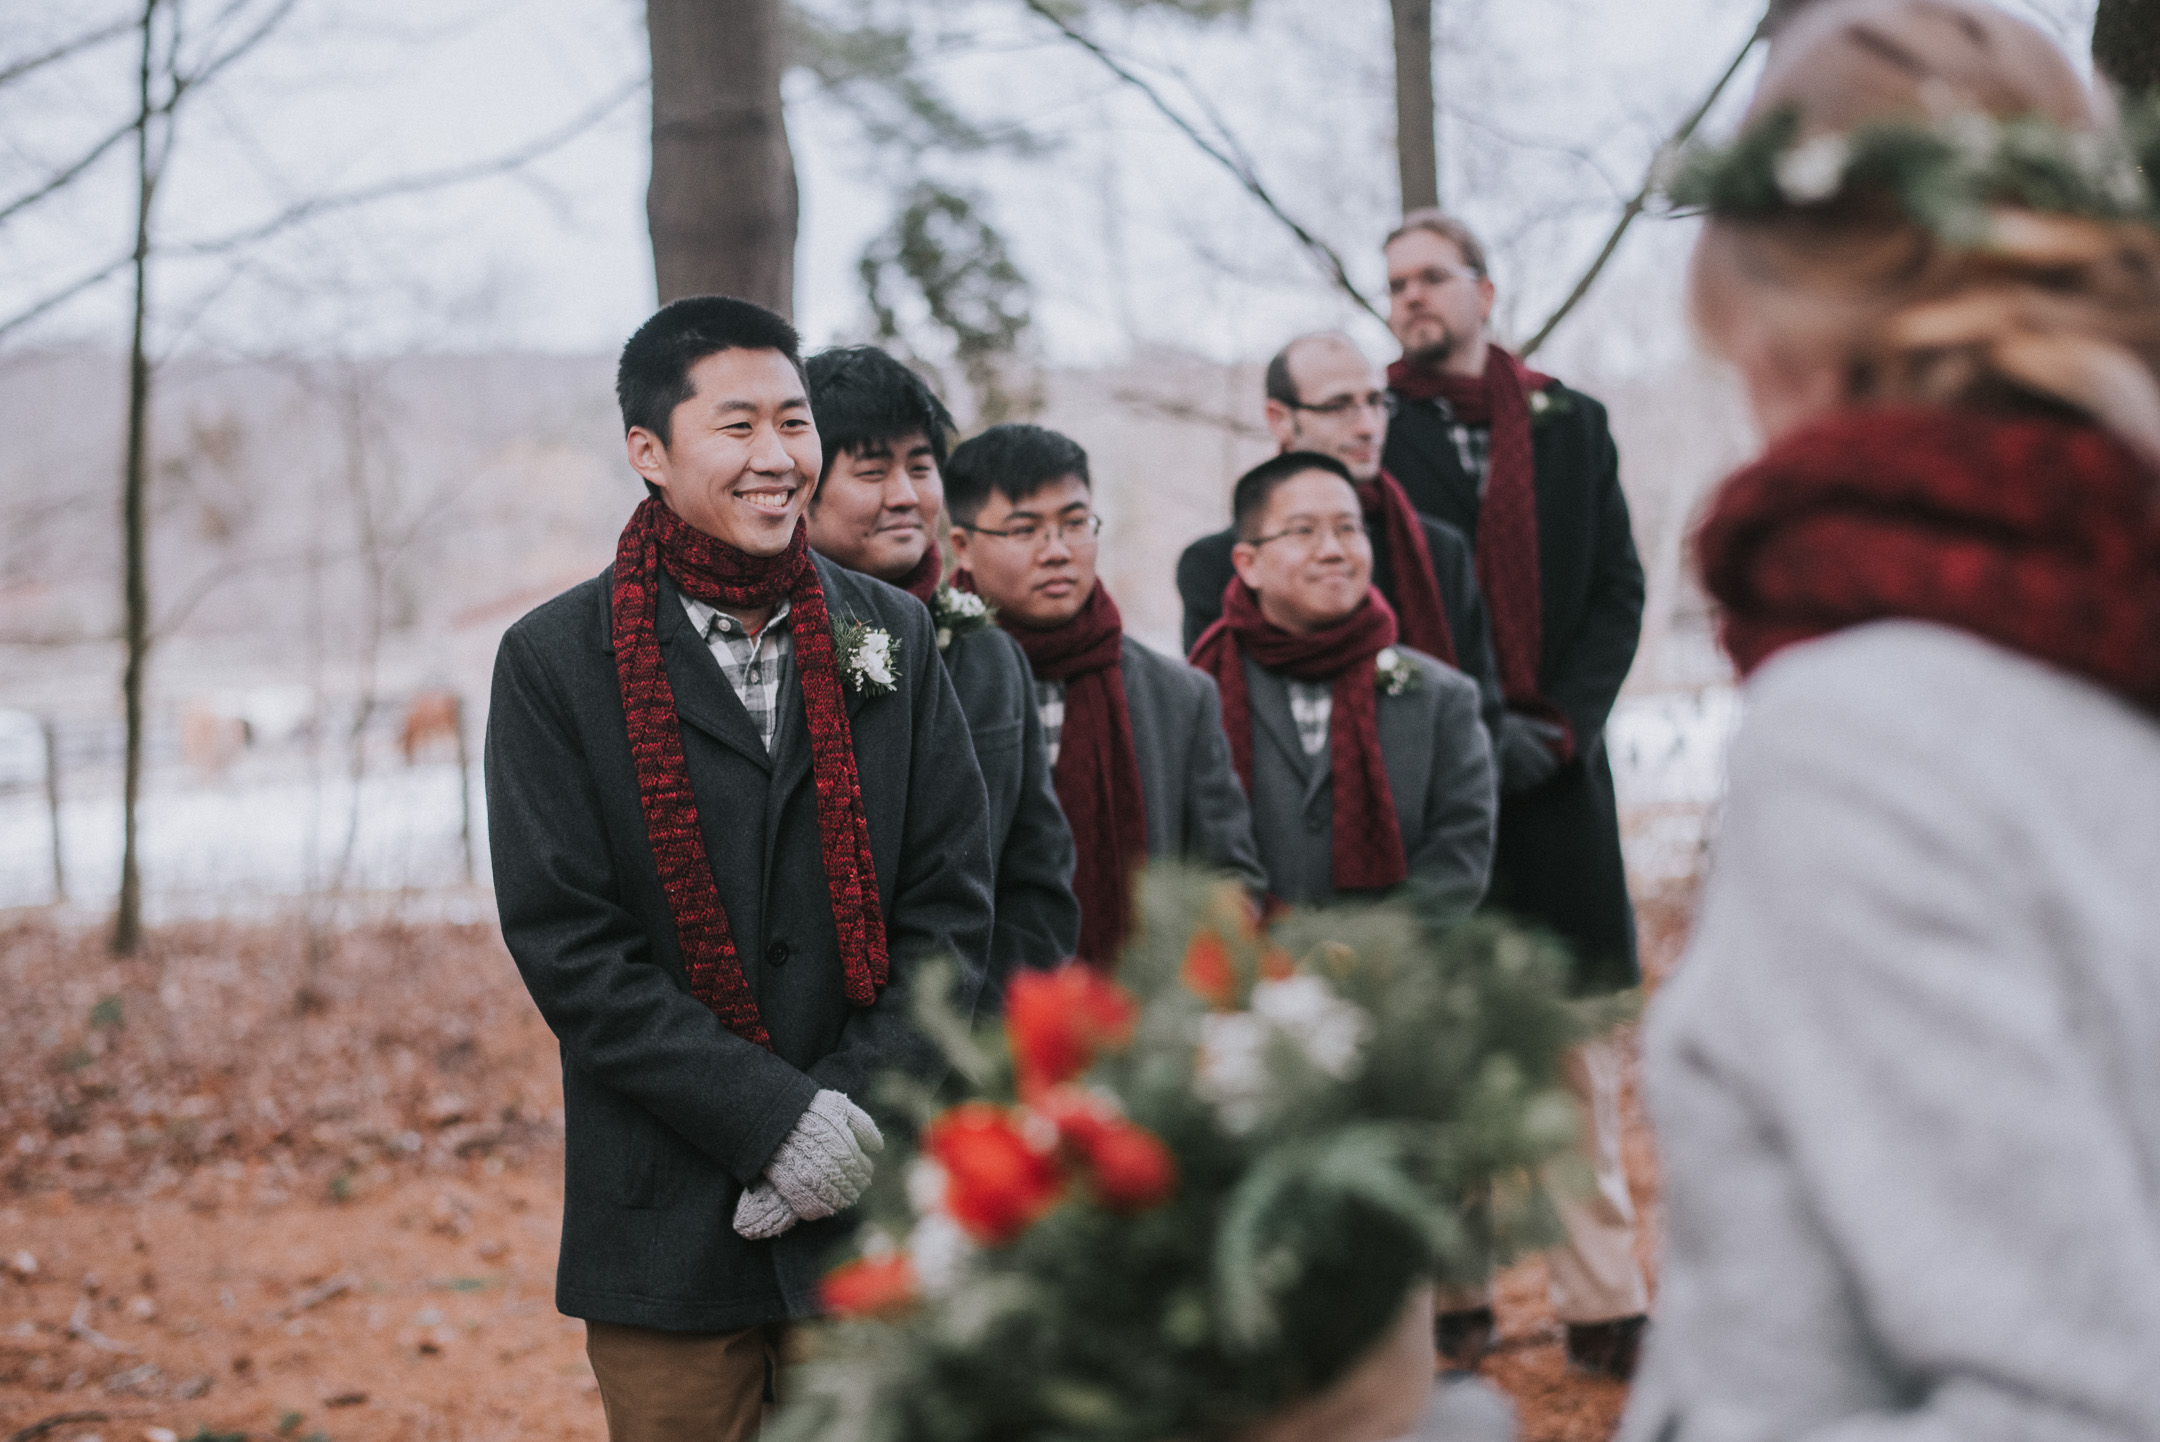 thurmont wedding photographer (13 of 38).jpg